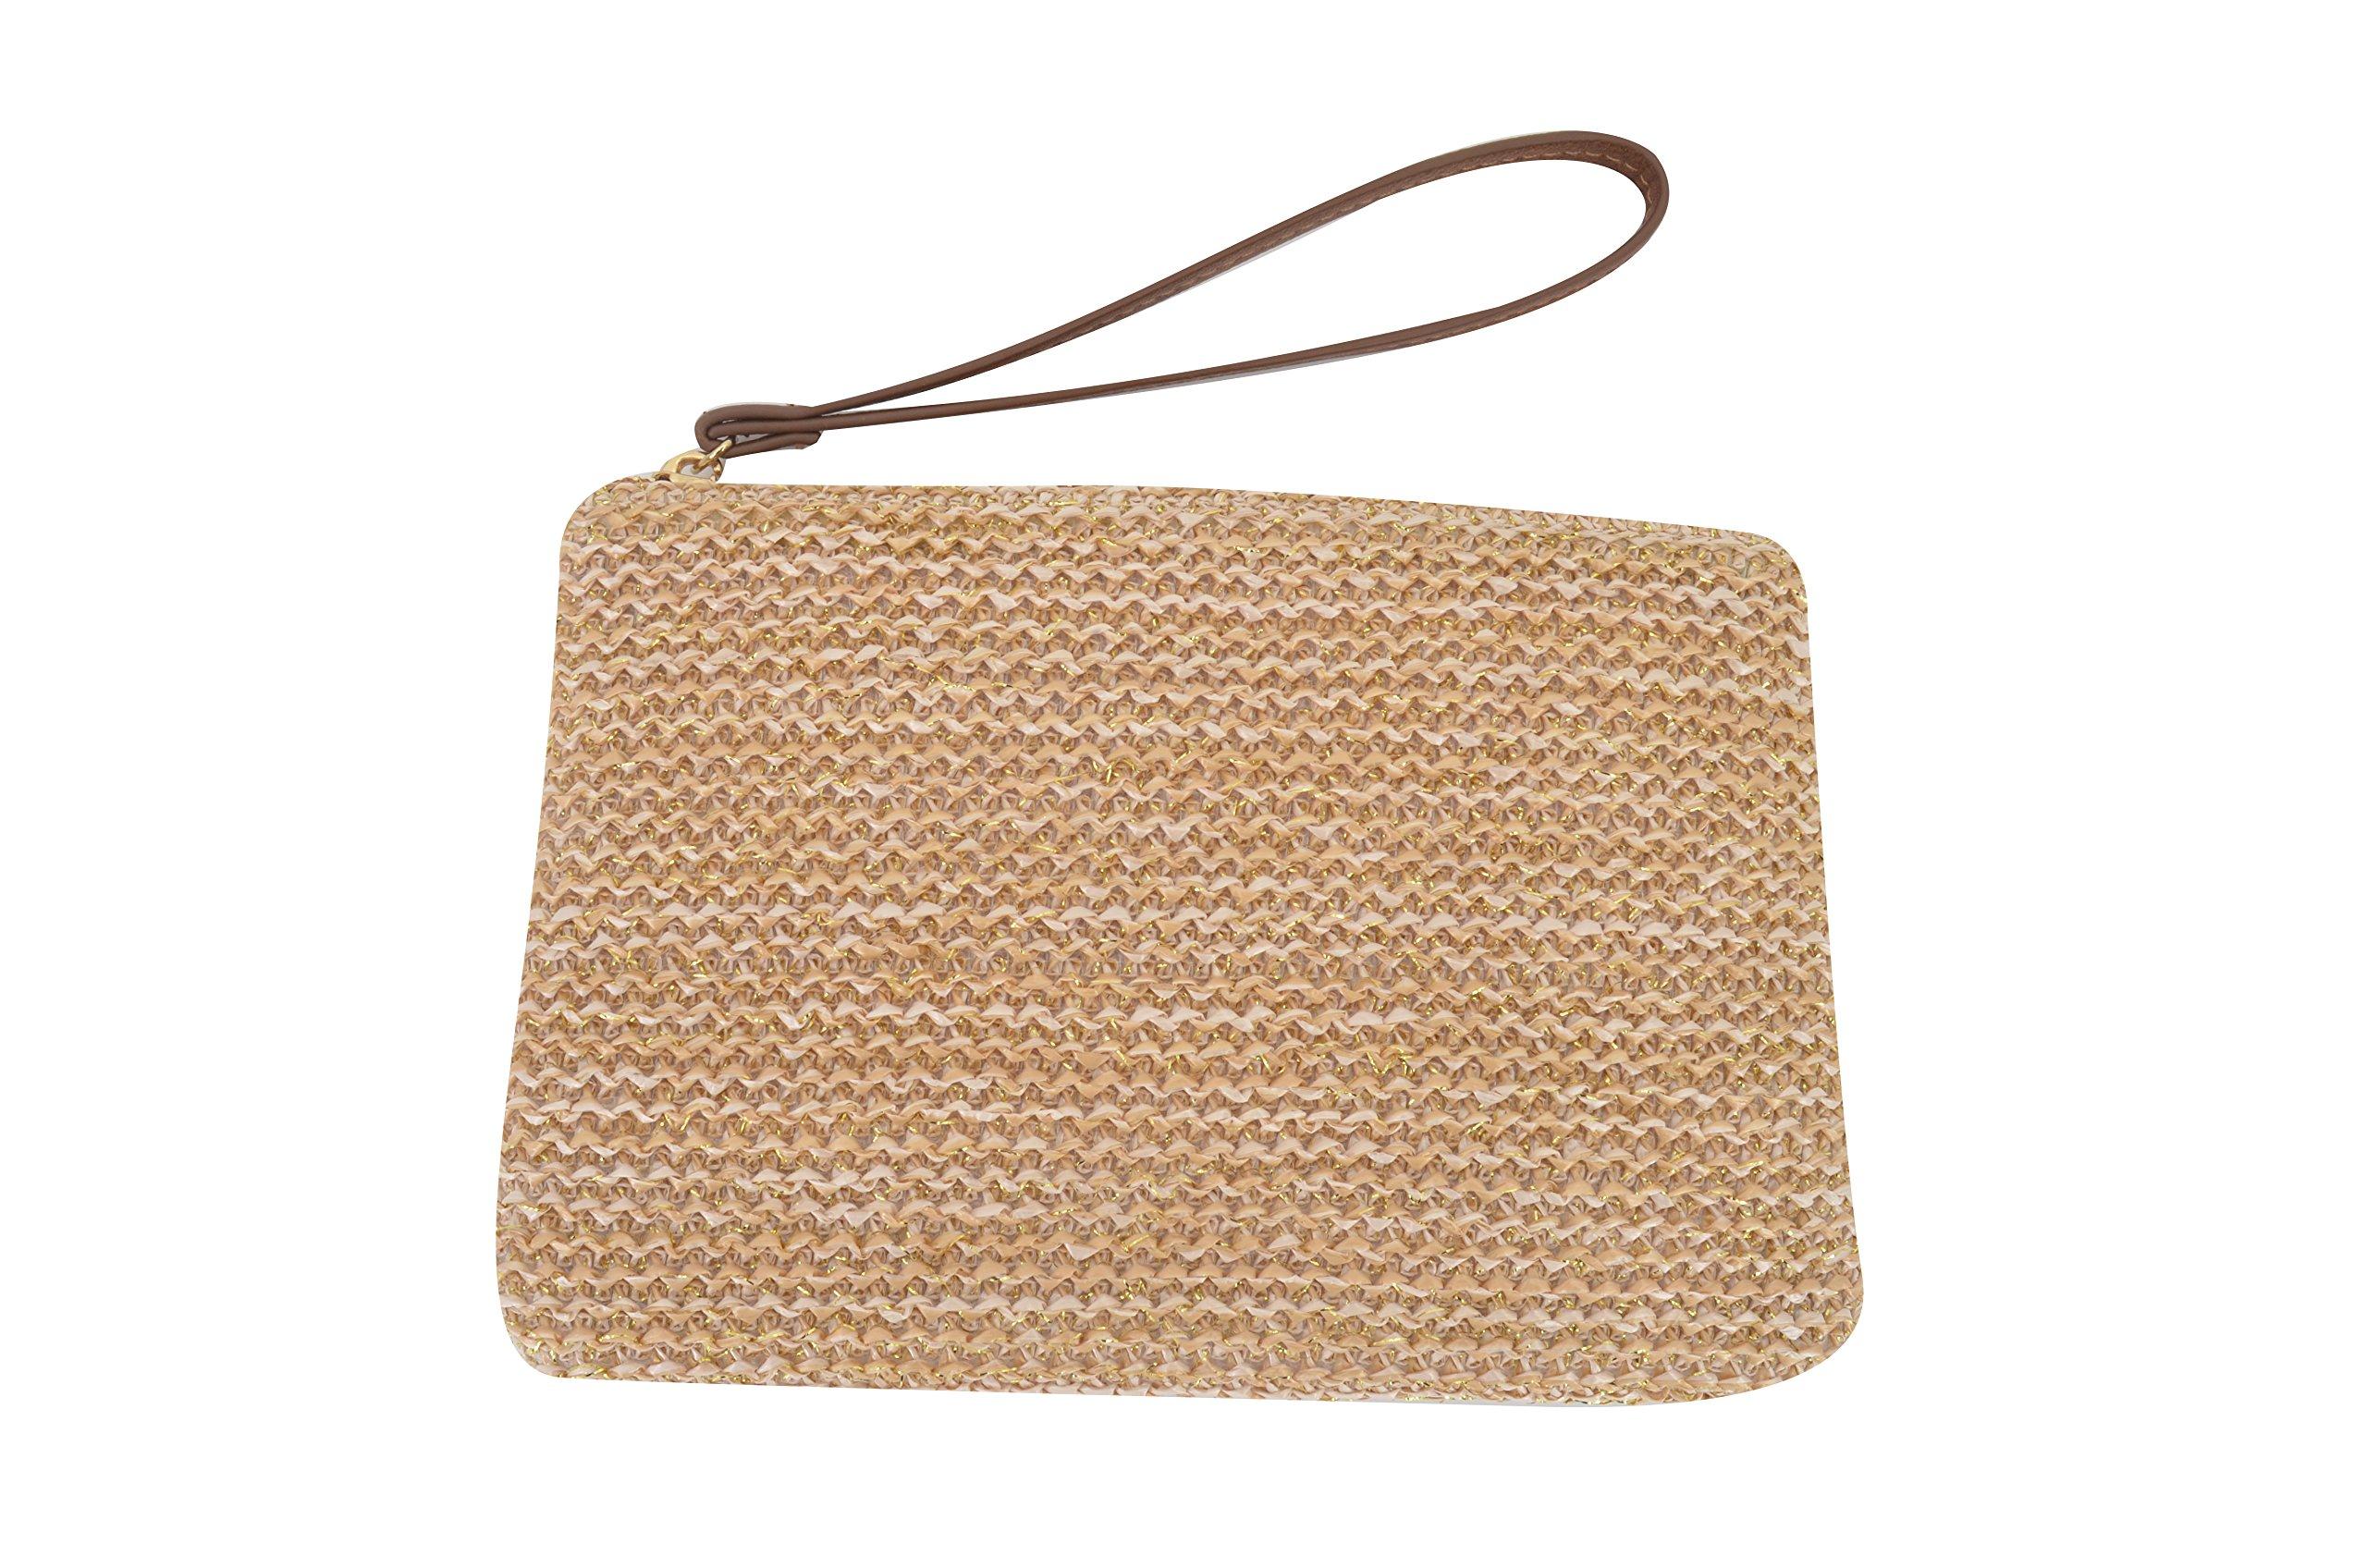 AGNETA Women's Hand Wrist Type Straw Clutch Summer Beach Sea Handbag (Brown Large) by AGNETA (Image #5)